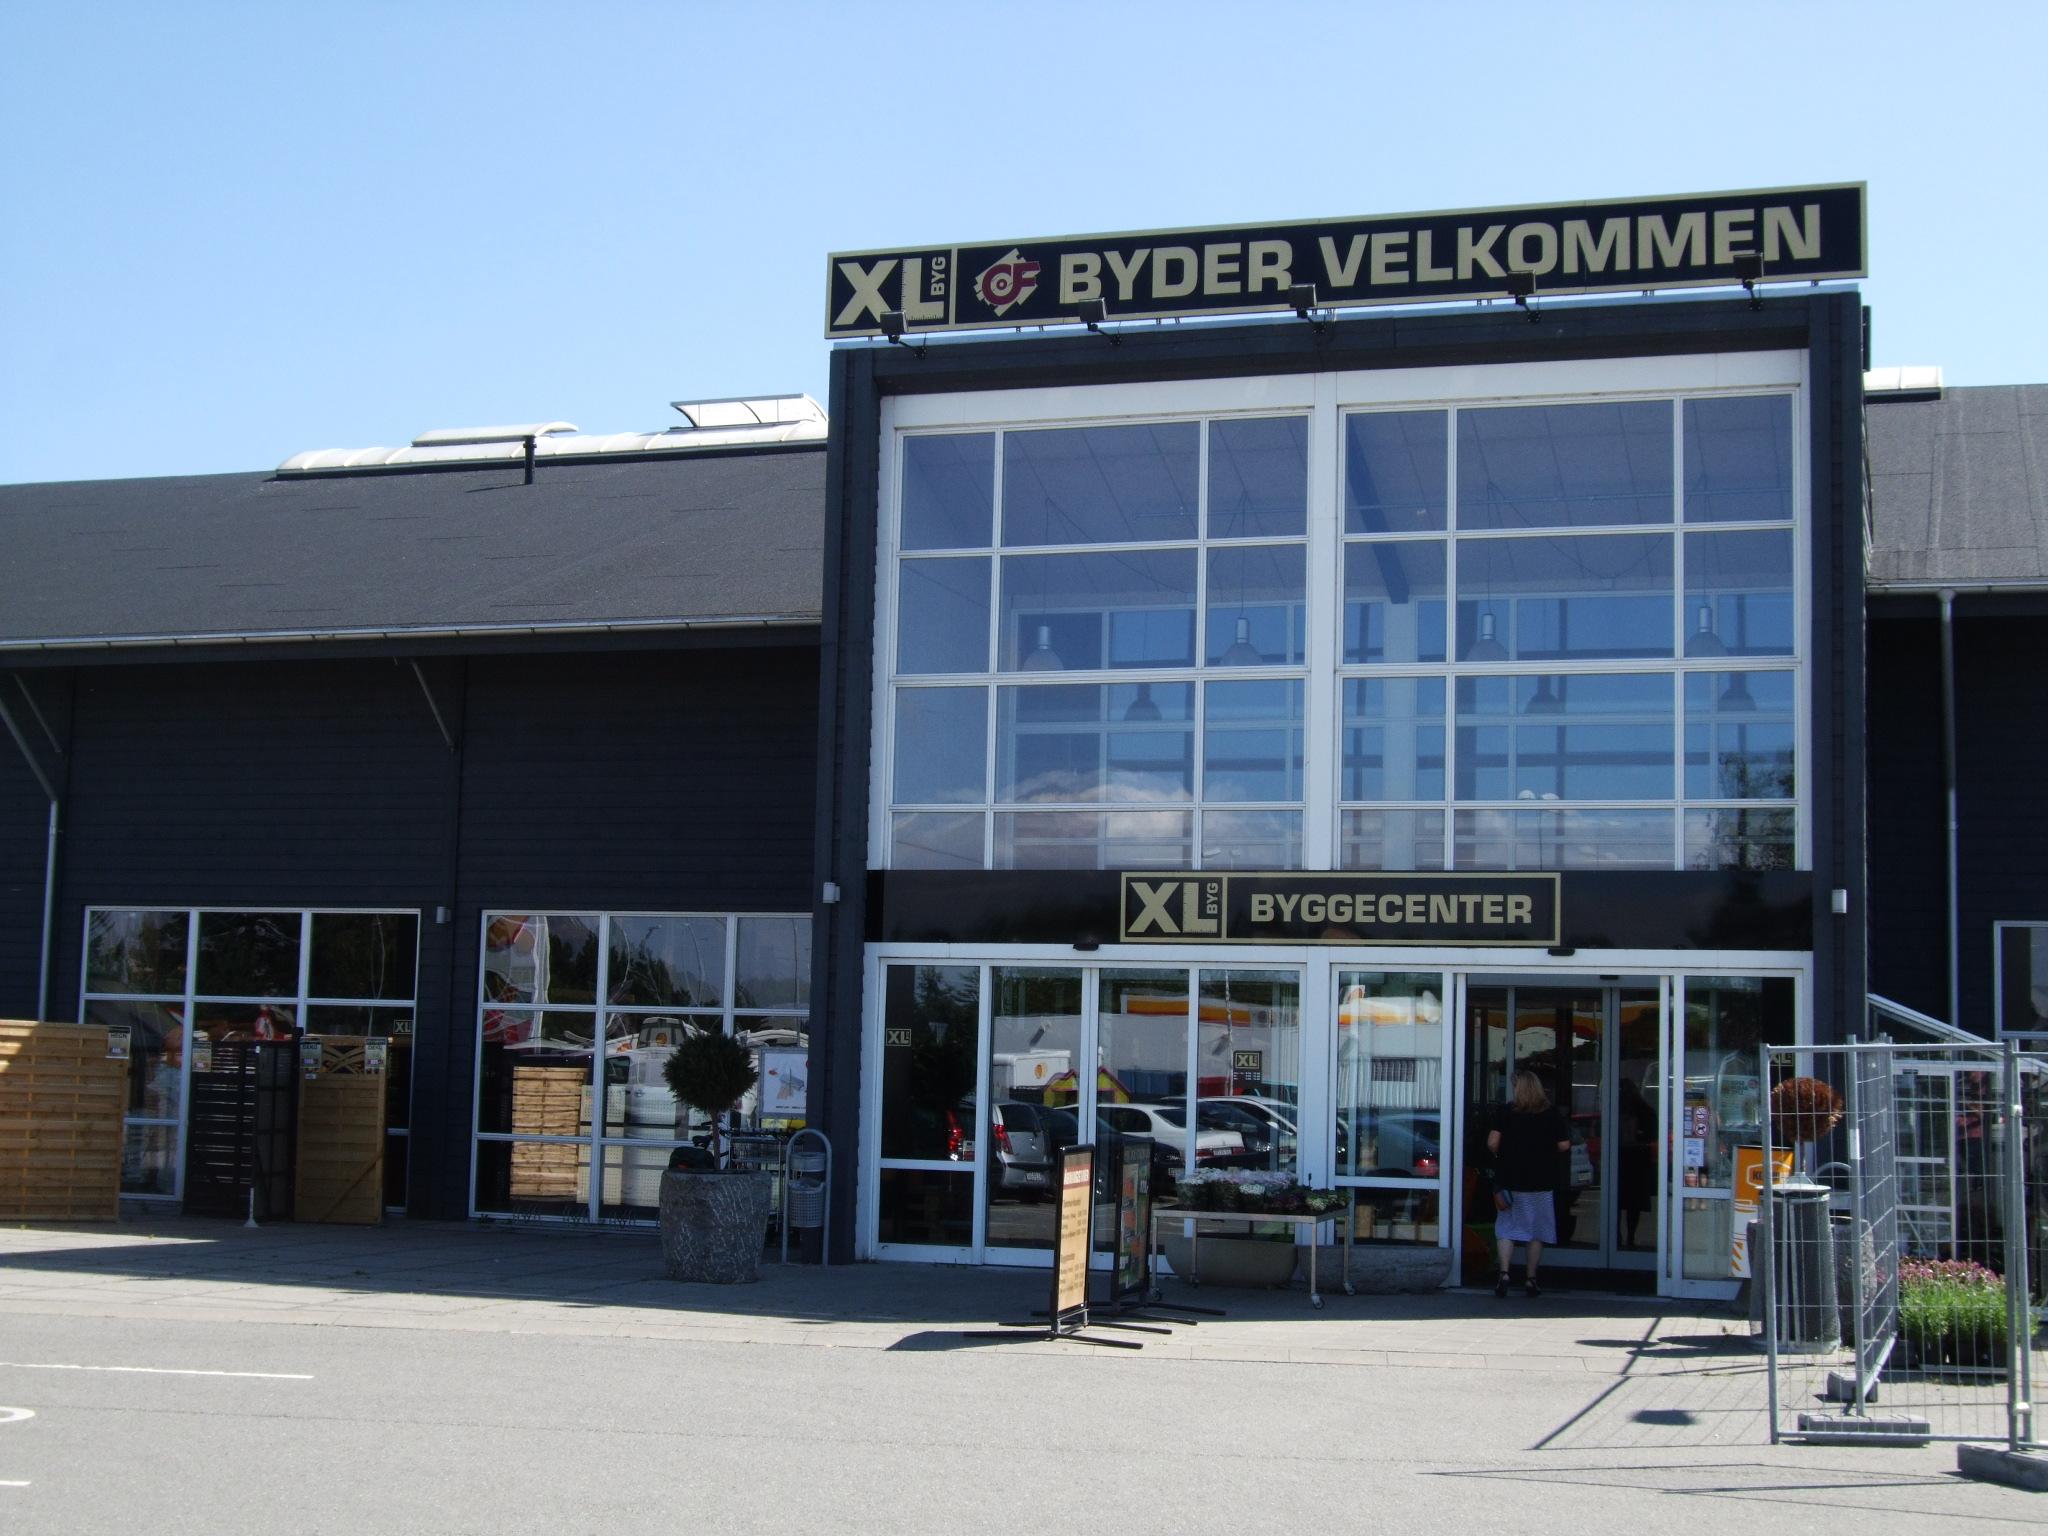 Shops in Denmark